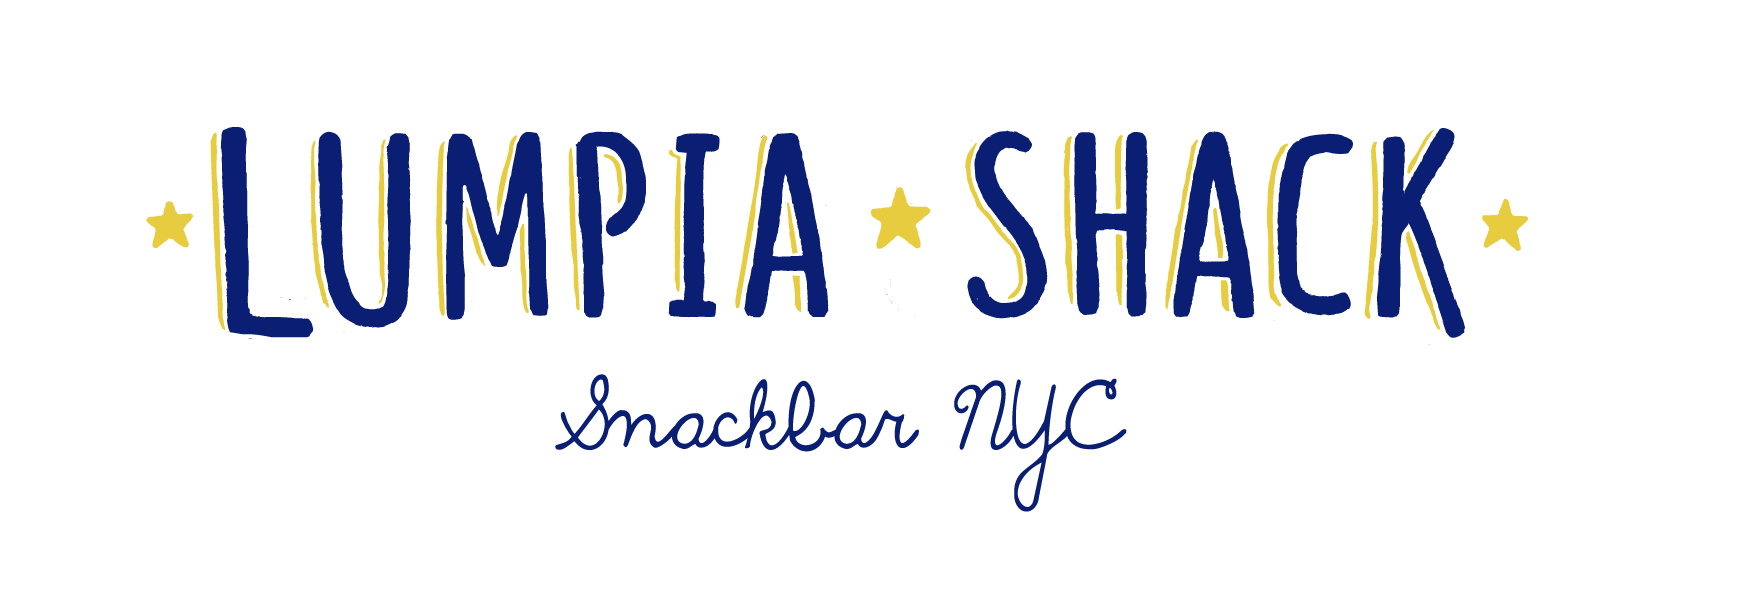 Lumpia Shack logo.png